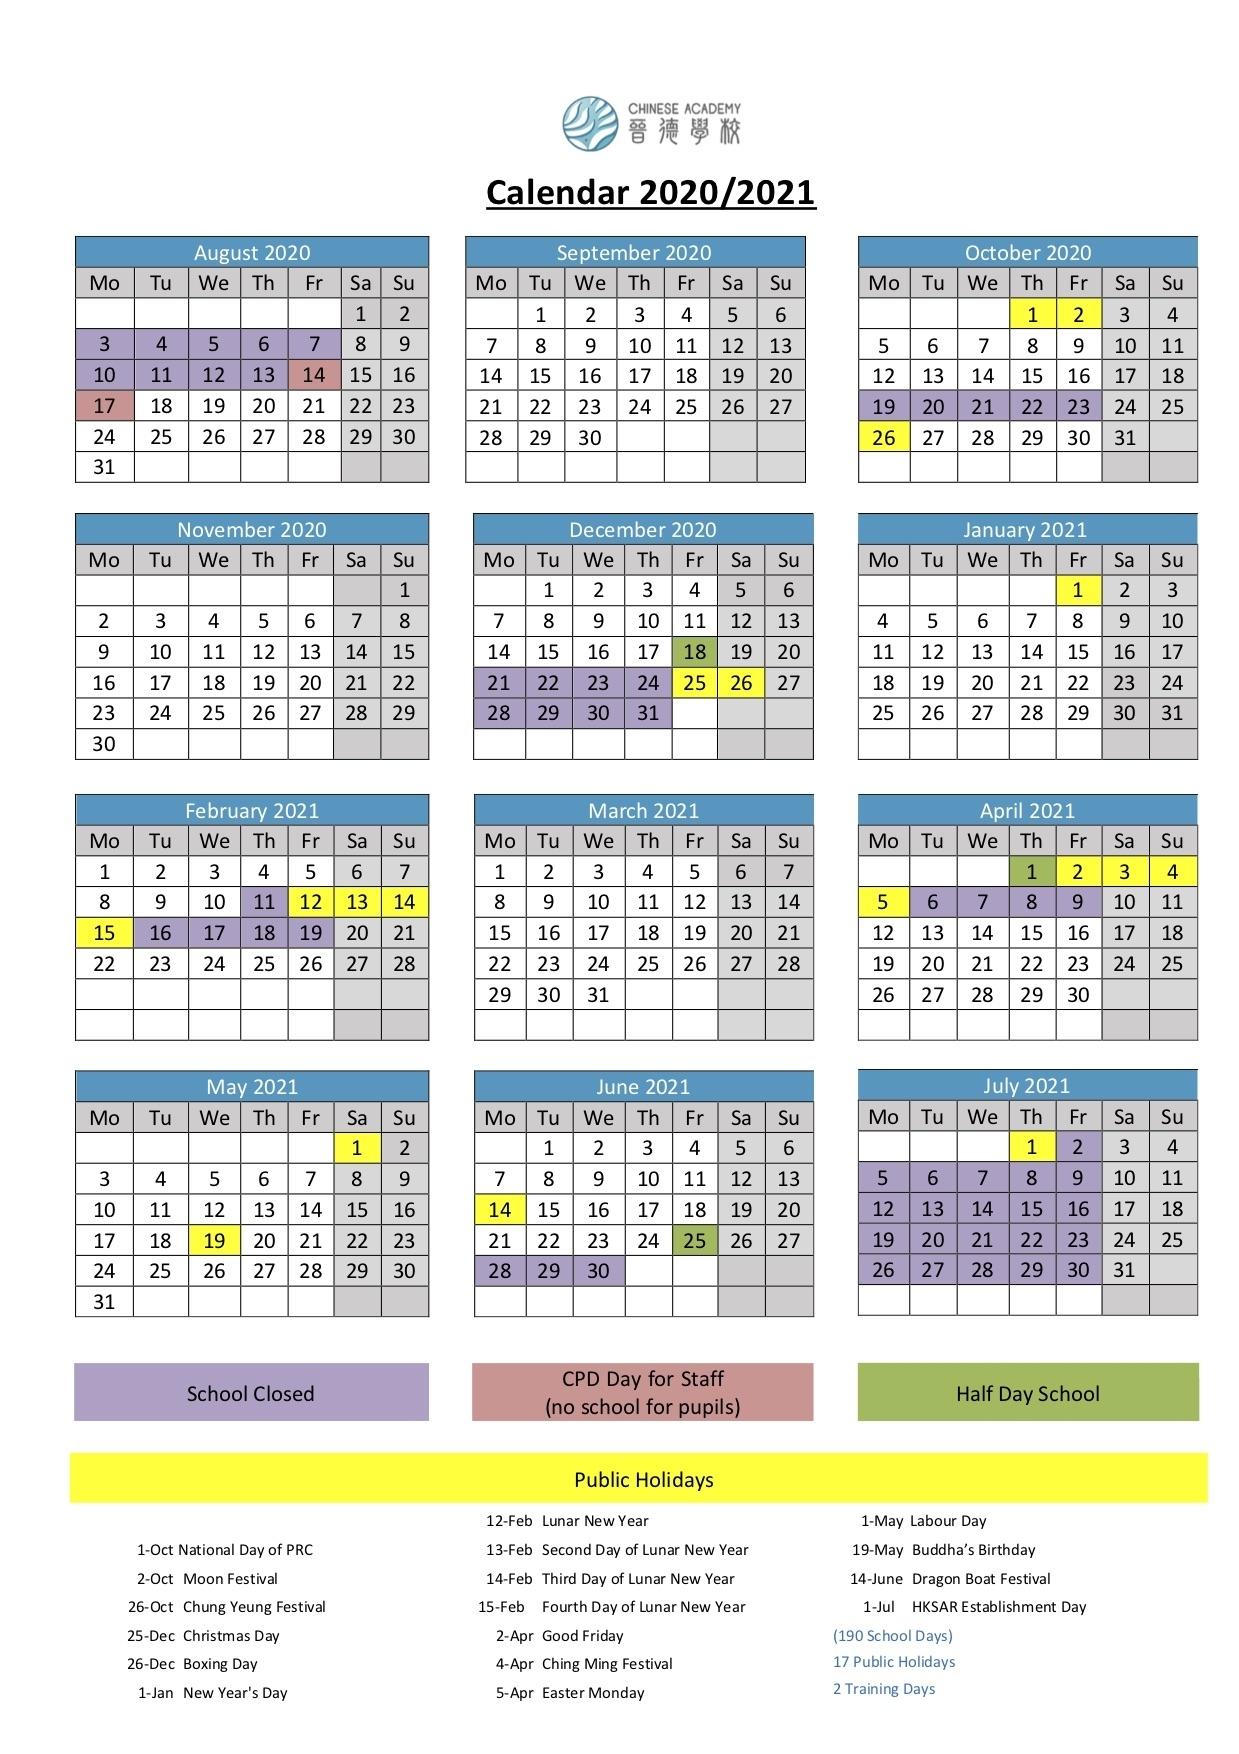 School Calendar 2020/2021 - International Chinese Academy 晉